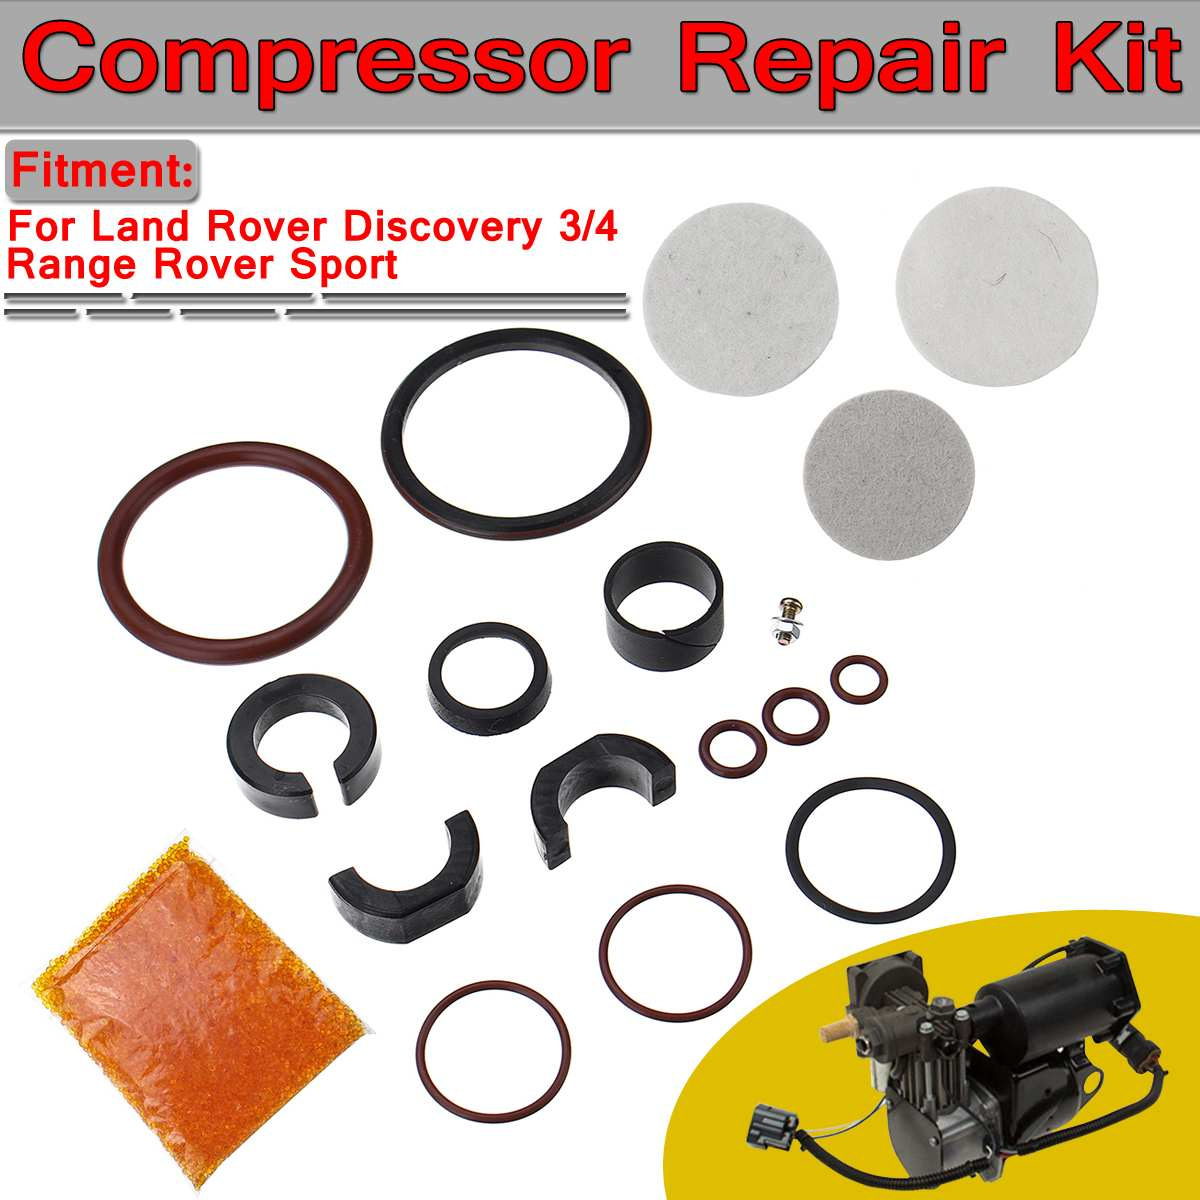 Auto Luftfederung A/C Kompressor Reparatur Kit Für Land Rover Discovery 3/4 Range Rover Sport RQG000017 RQG000018 RQG000019